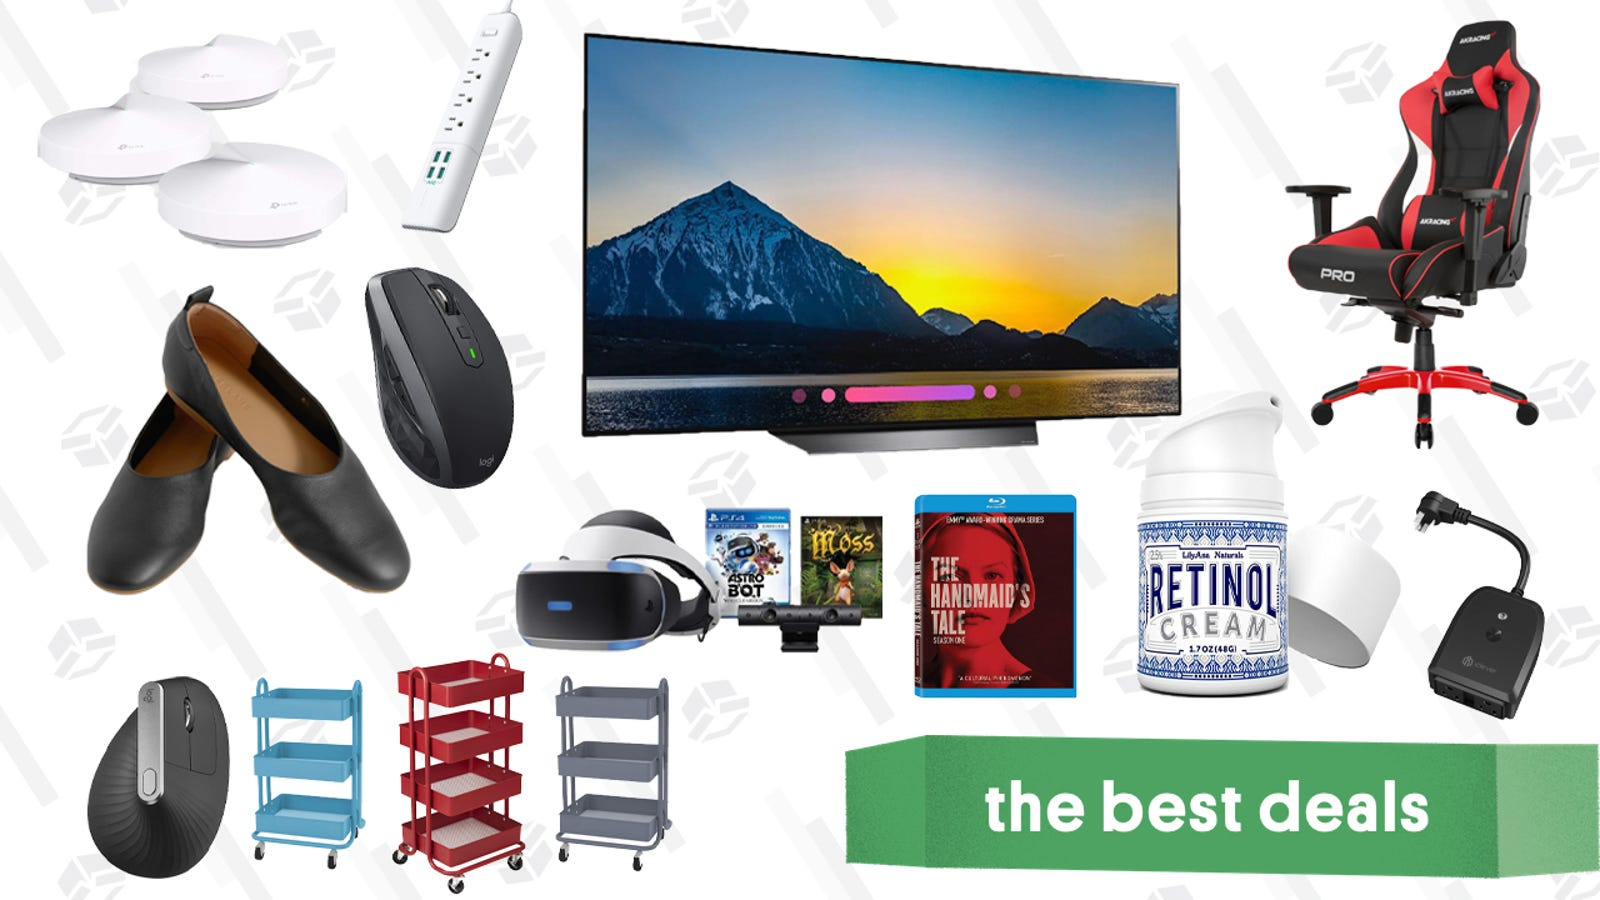 Thursday's Best Deals: Logitech Mice, OLED TVs, Everlane Flats, And More